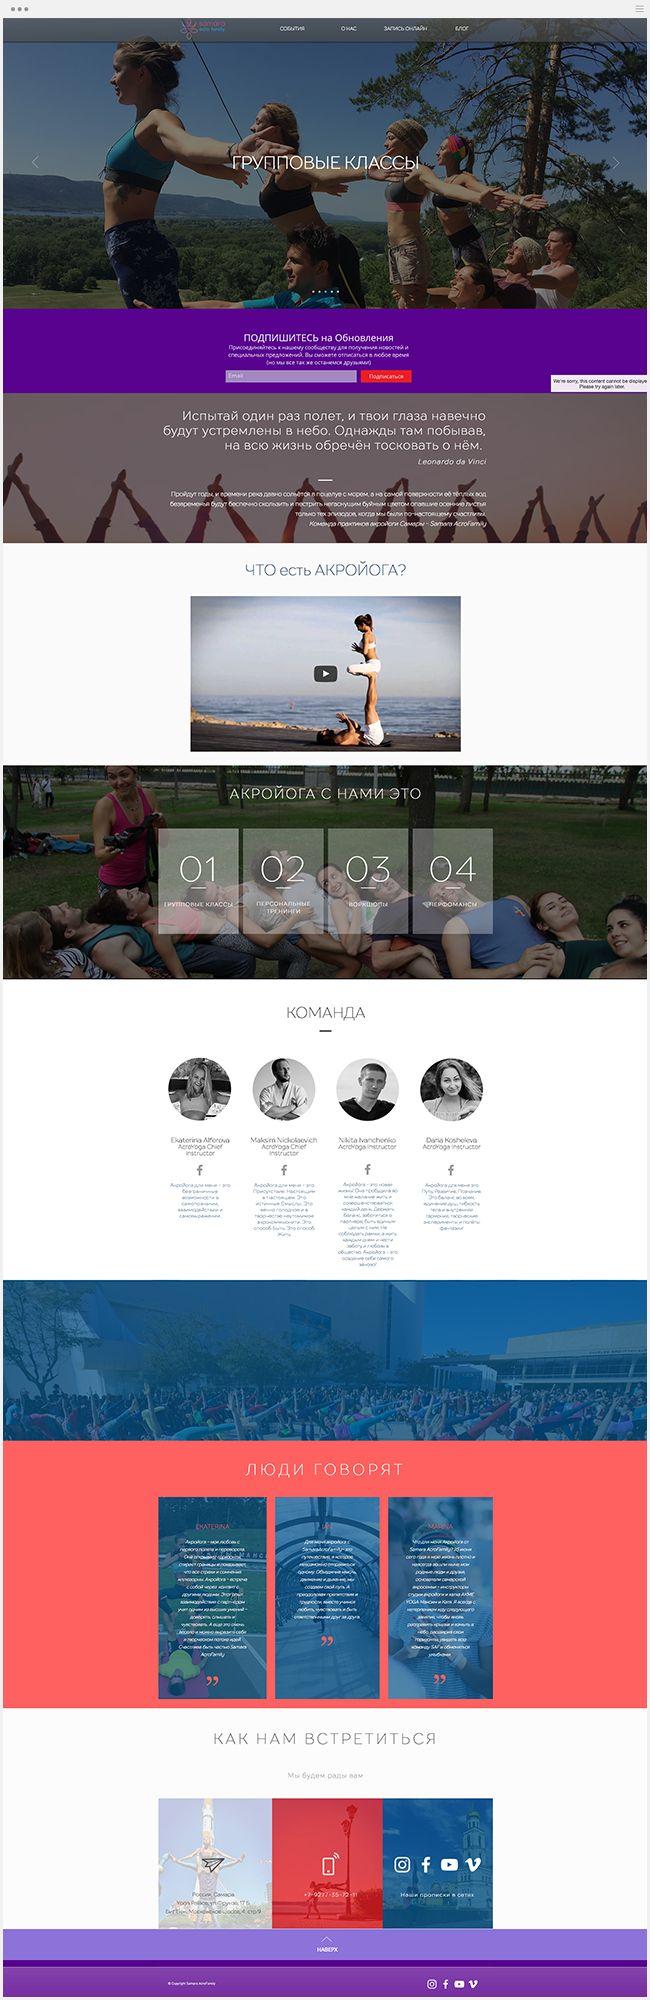 Samara Acro Family | Acro Studio